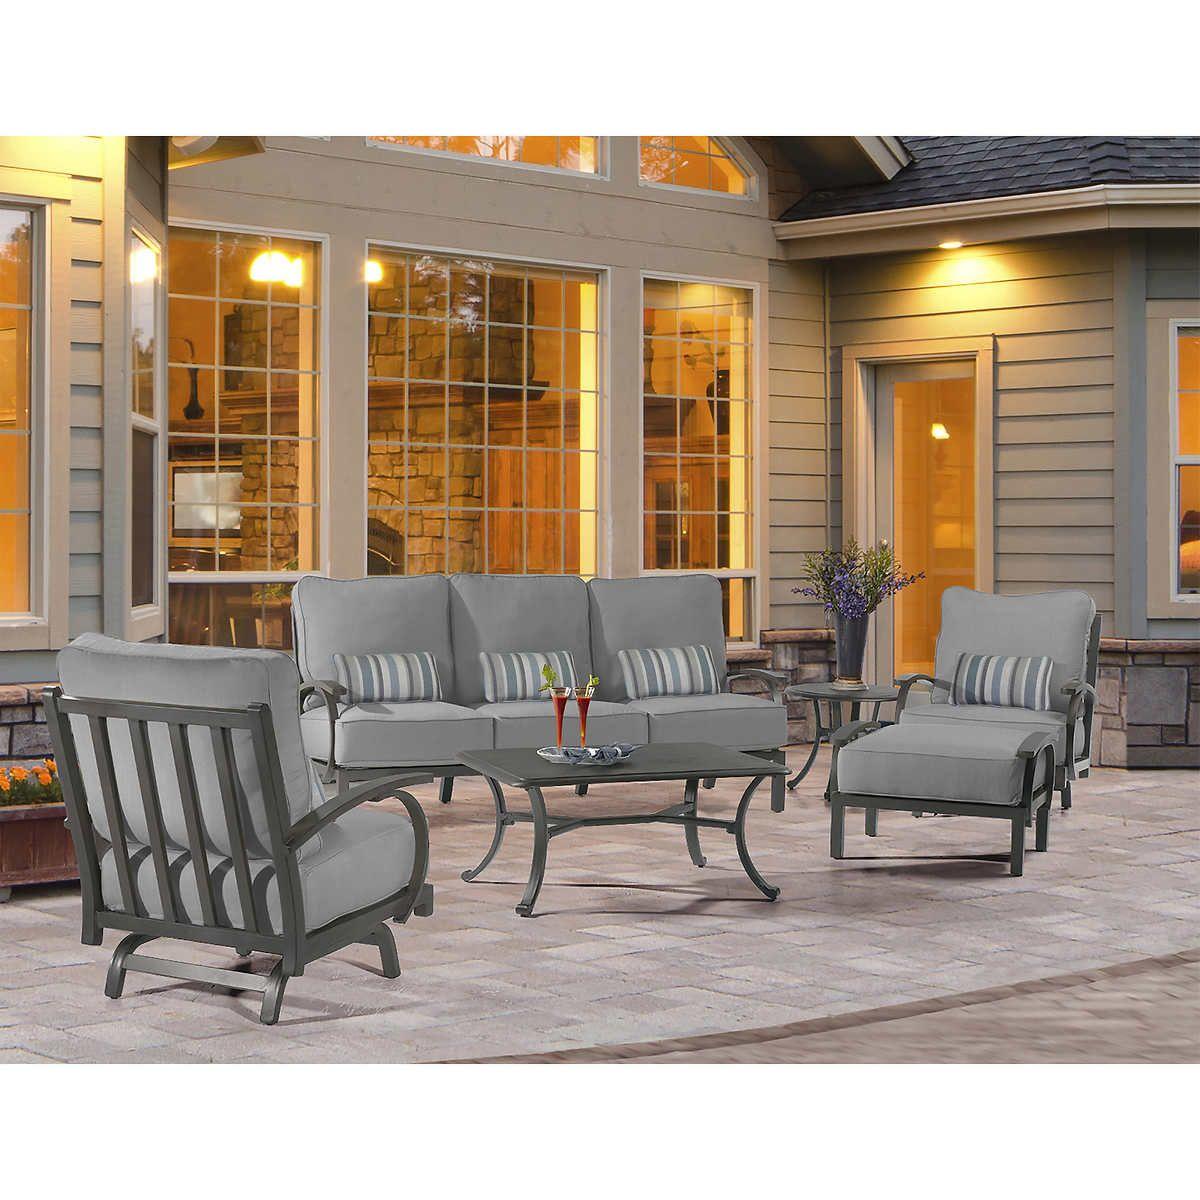 Madison 6piece Seating Set Outdoor furniture sets